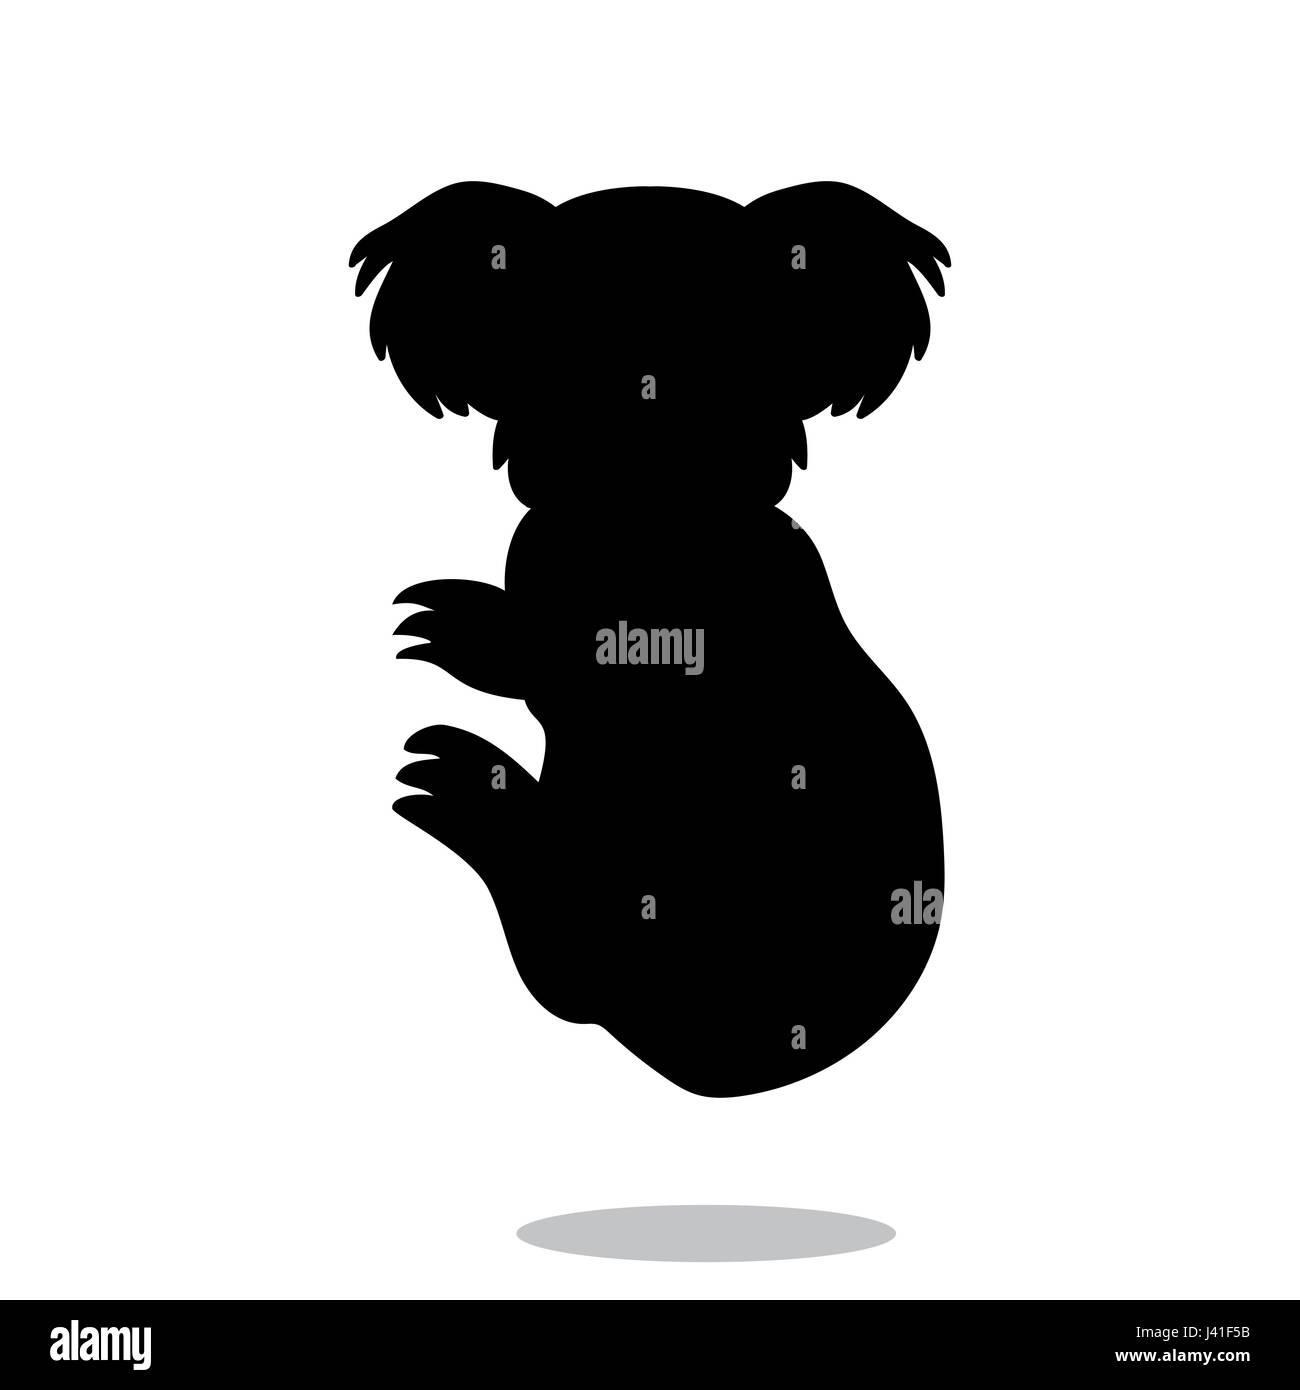 Koala marsupial mammal black silhouette animal - Stock Image